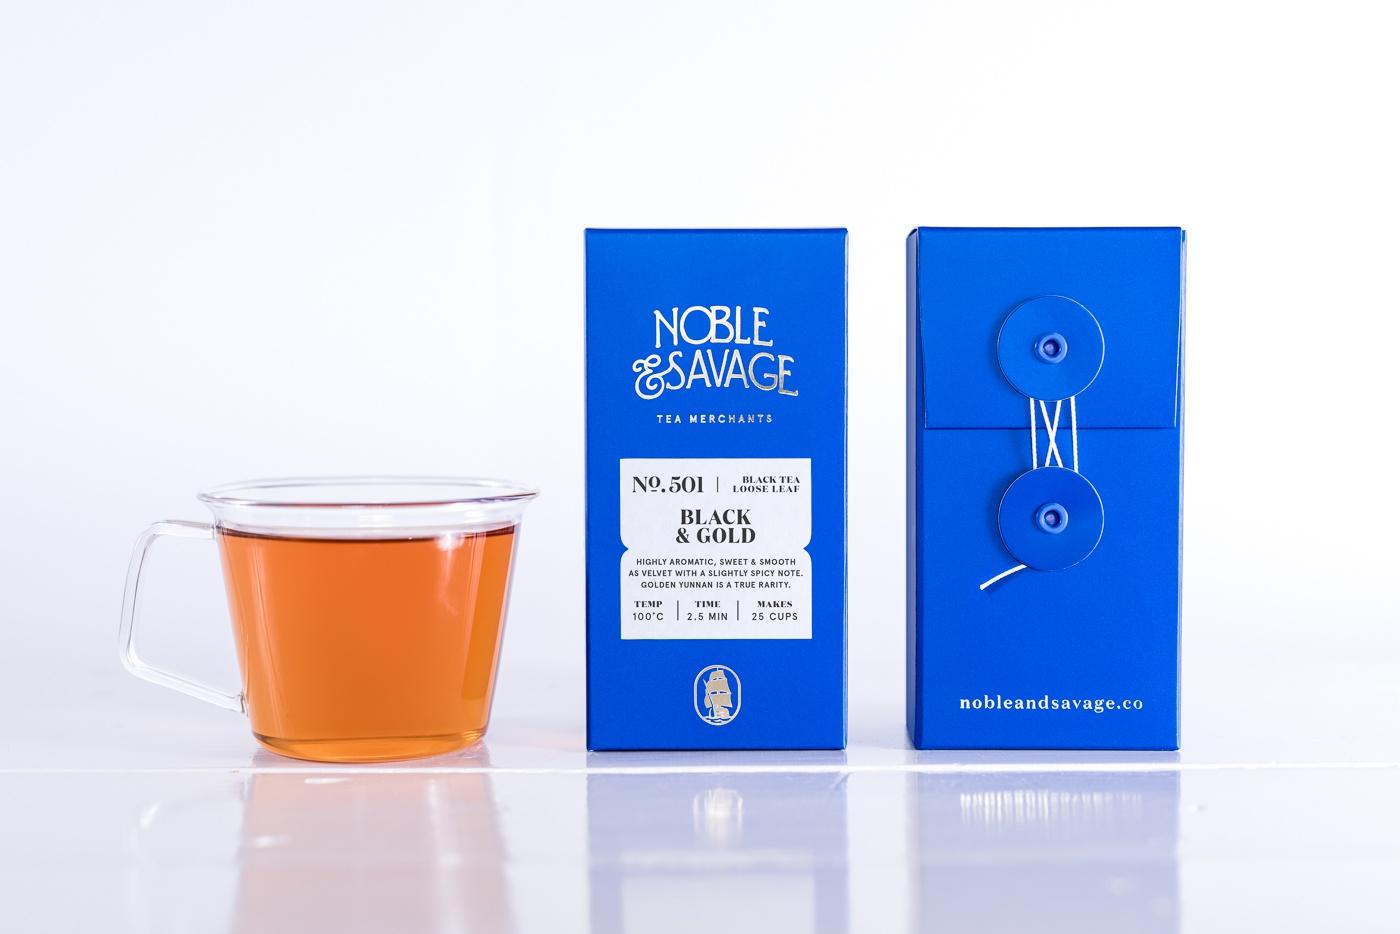 noble-savage-new-zealand-tea